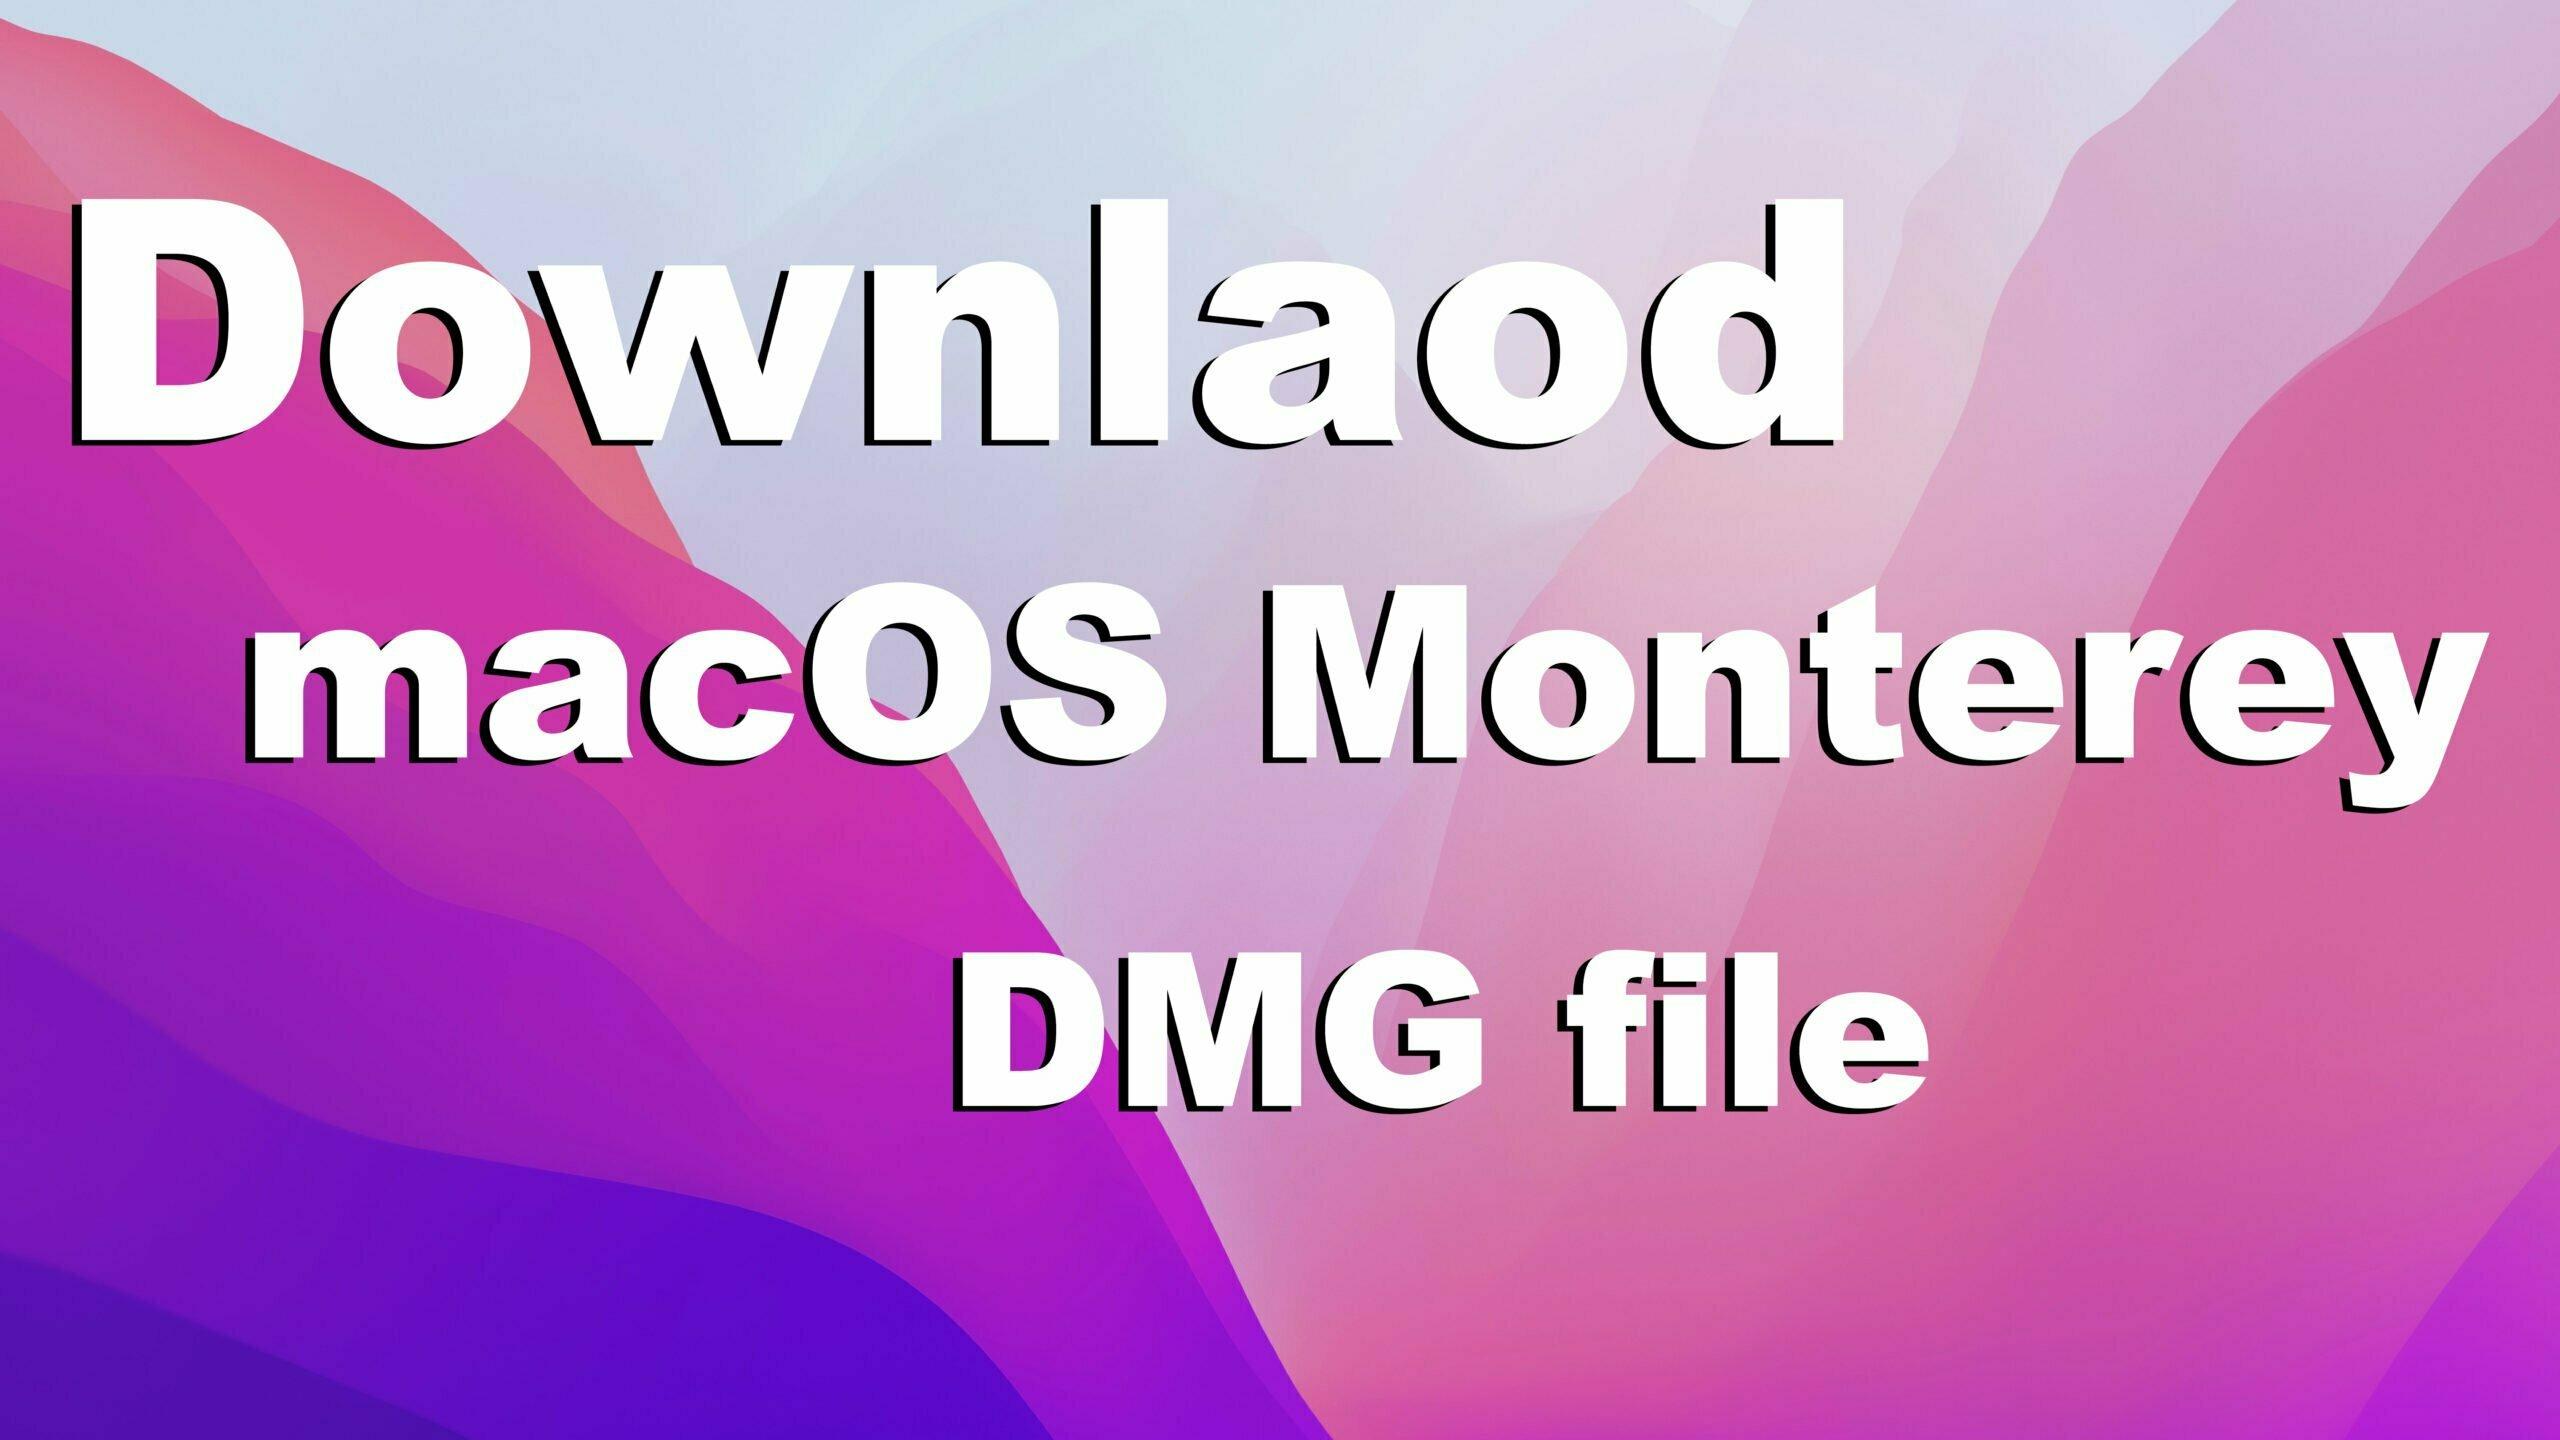 Download macOS Monterey DMG File - Latest Version